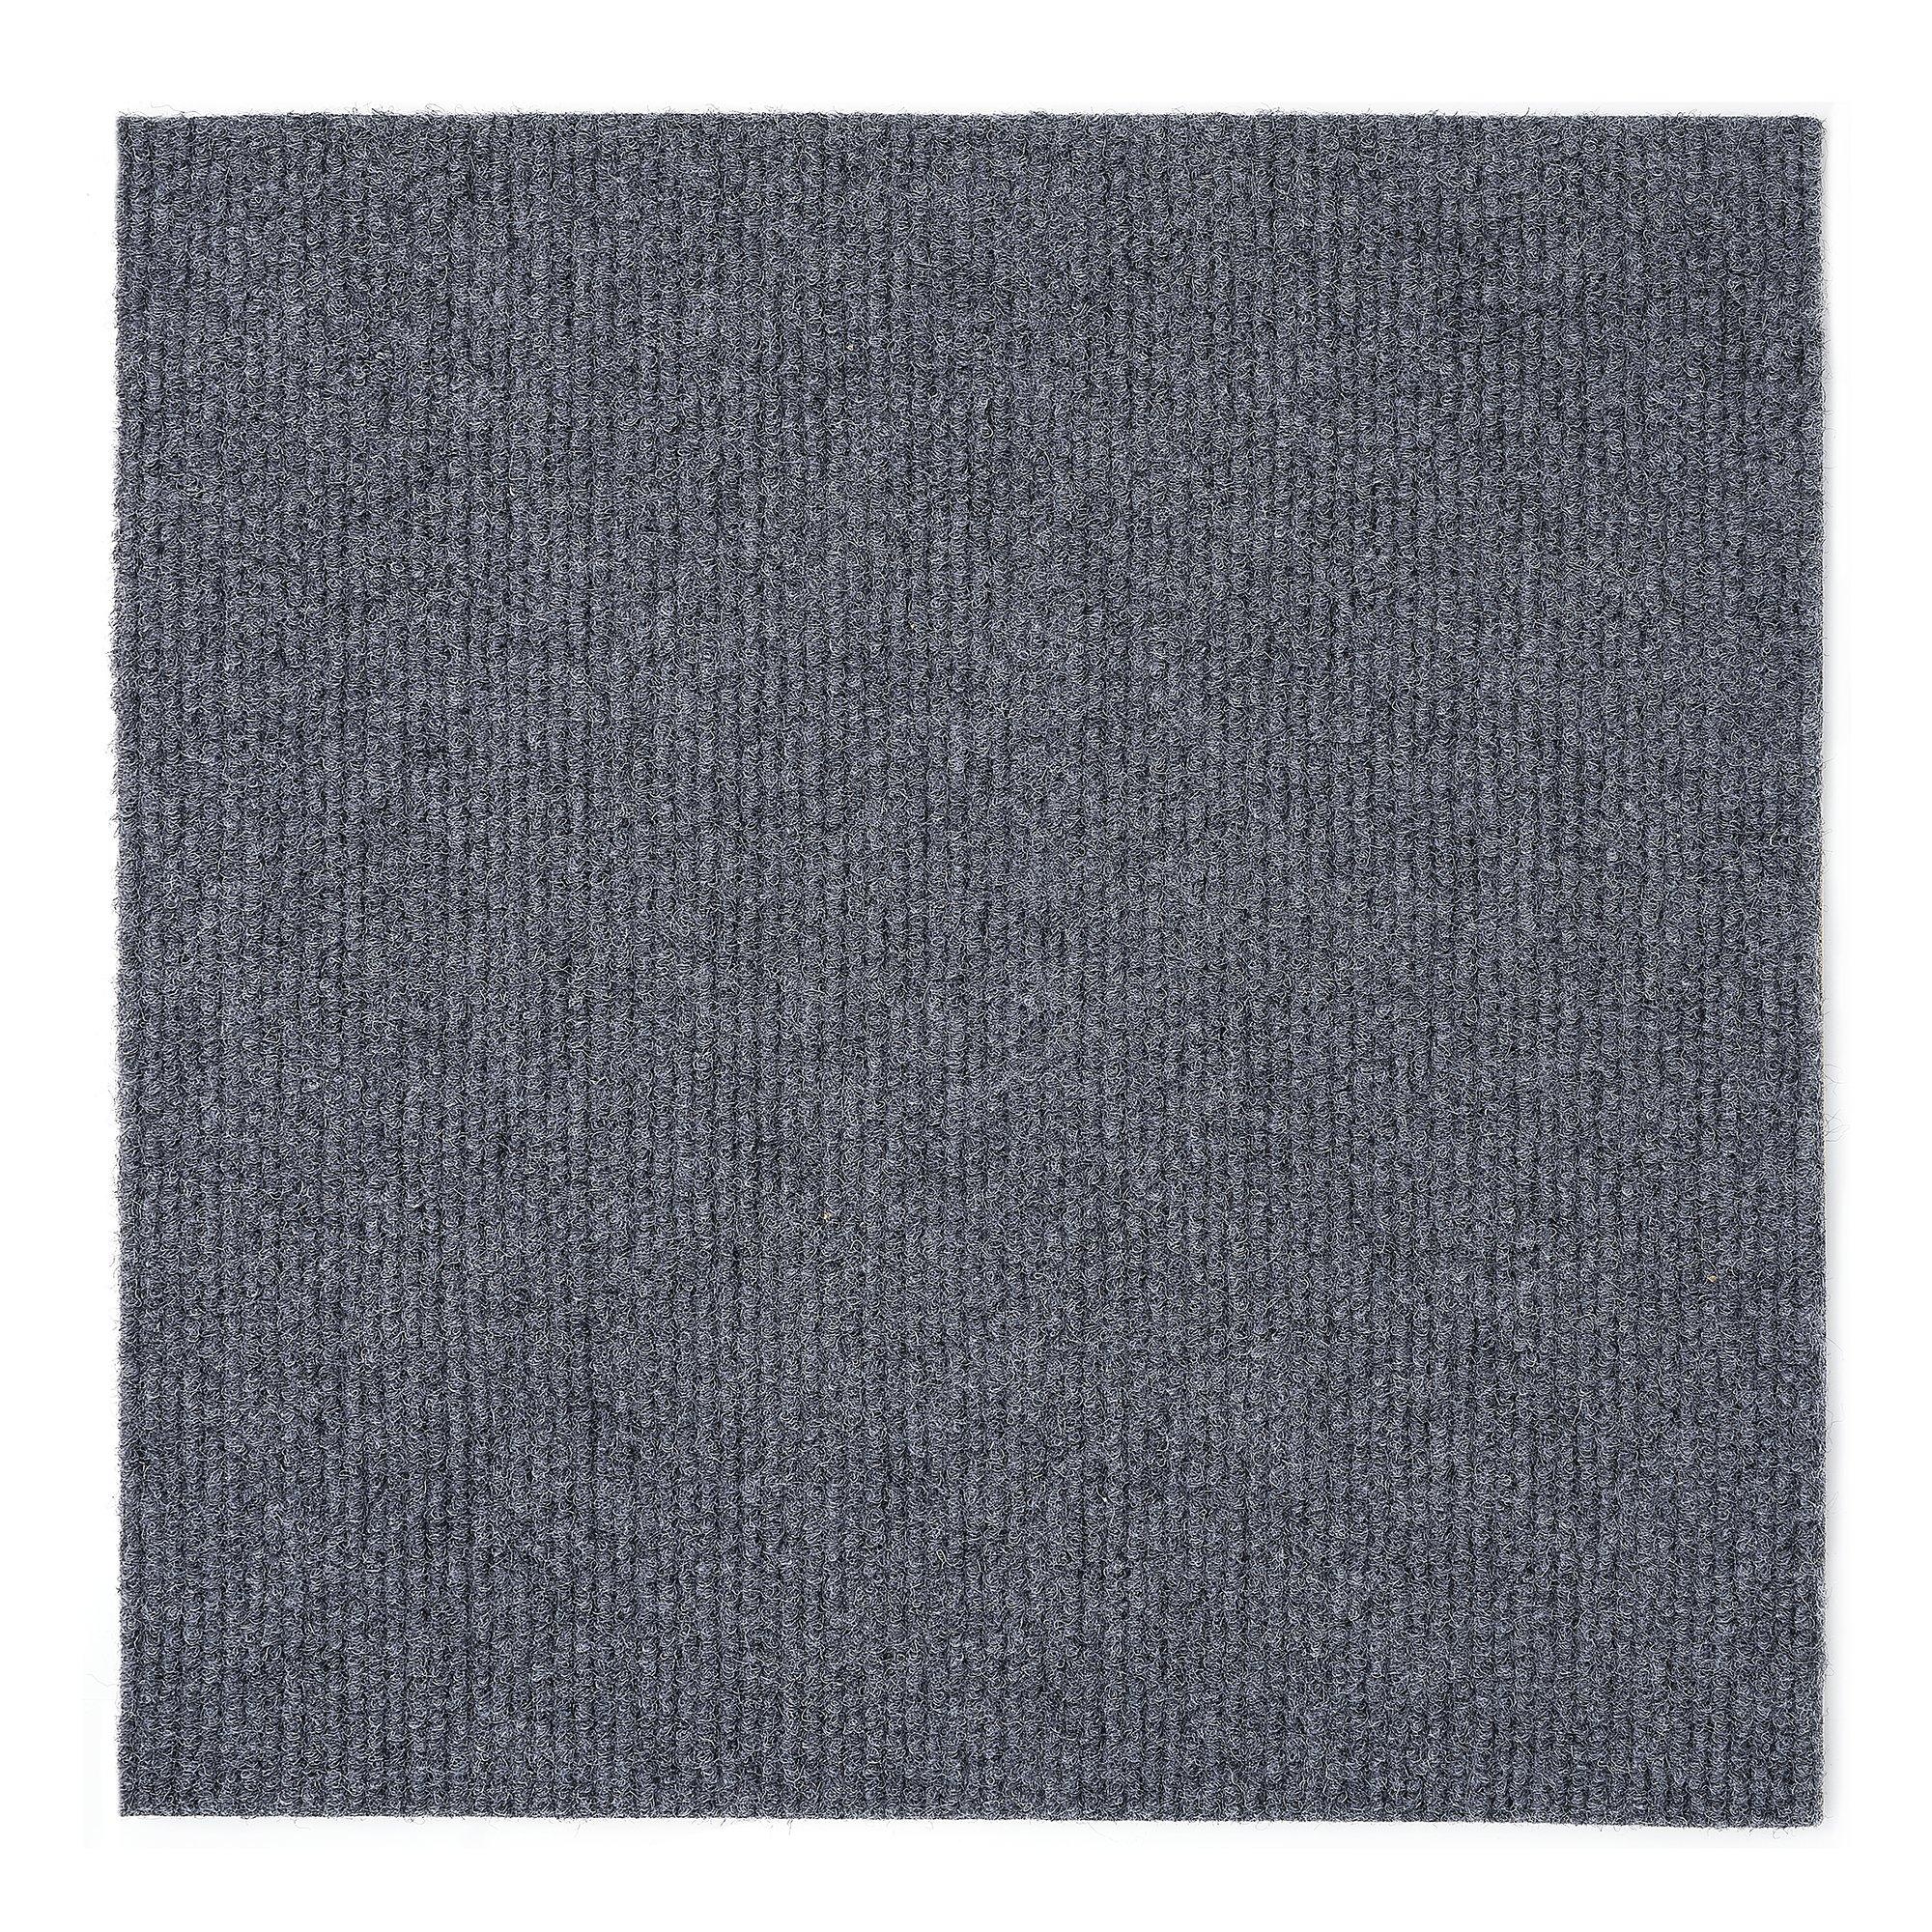 Achim Home Furnishings NXCRPTSM12 Nexus 12 inch x 12 inch Self Adhesive Carpet Floor Tile, 12 Tiles/12 Sq'., Smoke by Achim Home Furnishings